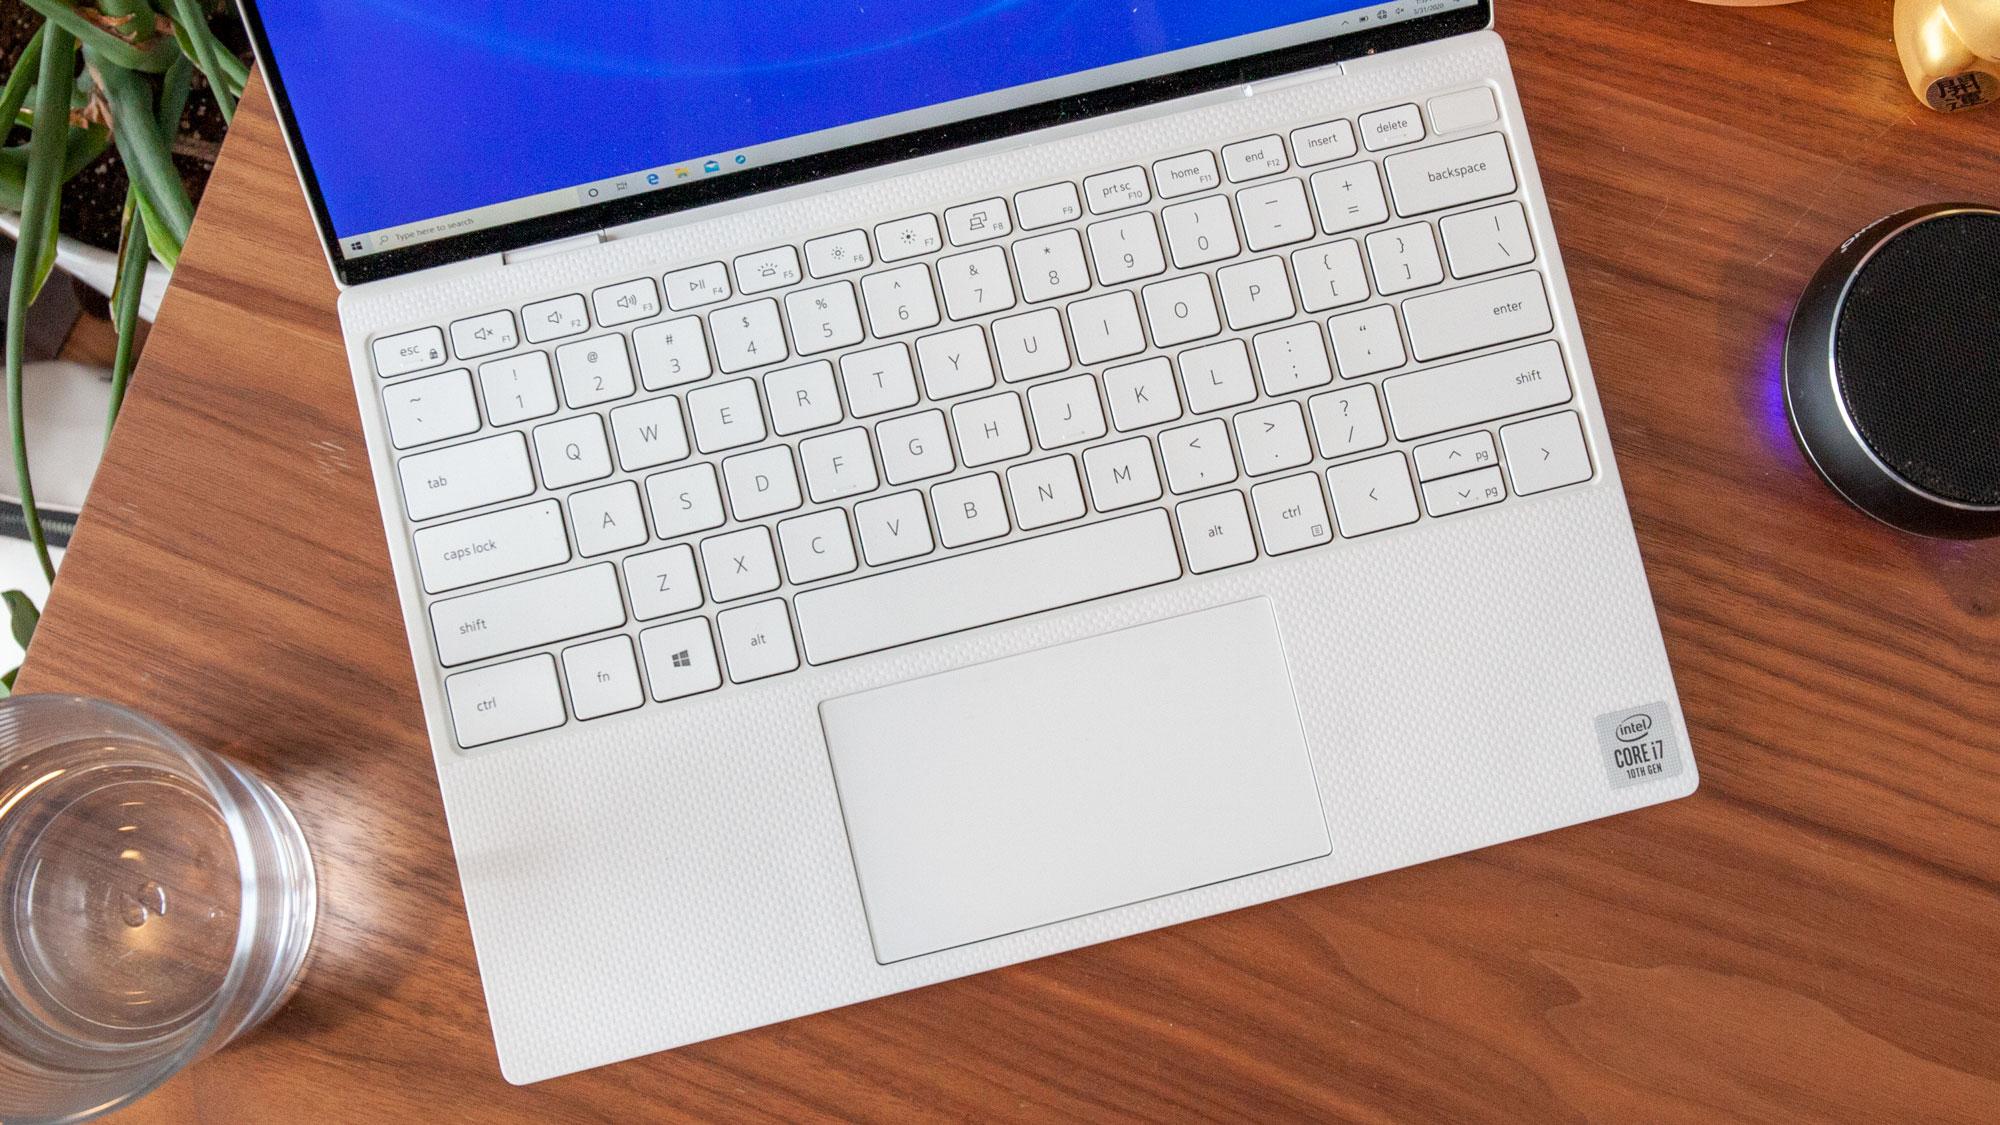 Dell XPS 13 vs MacBook Pro - XPS 13 keyboard